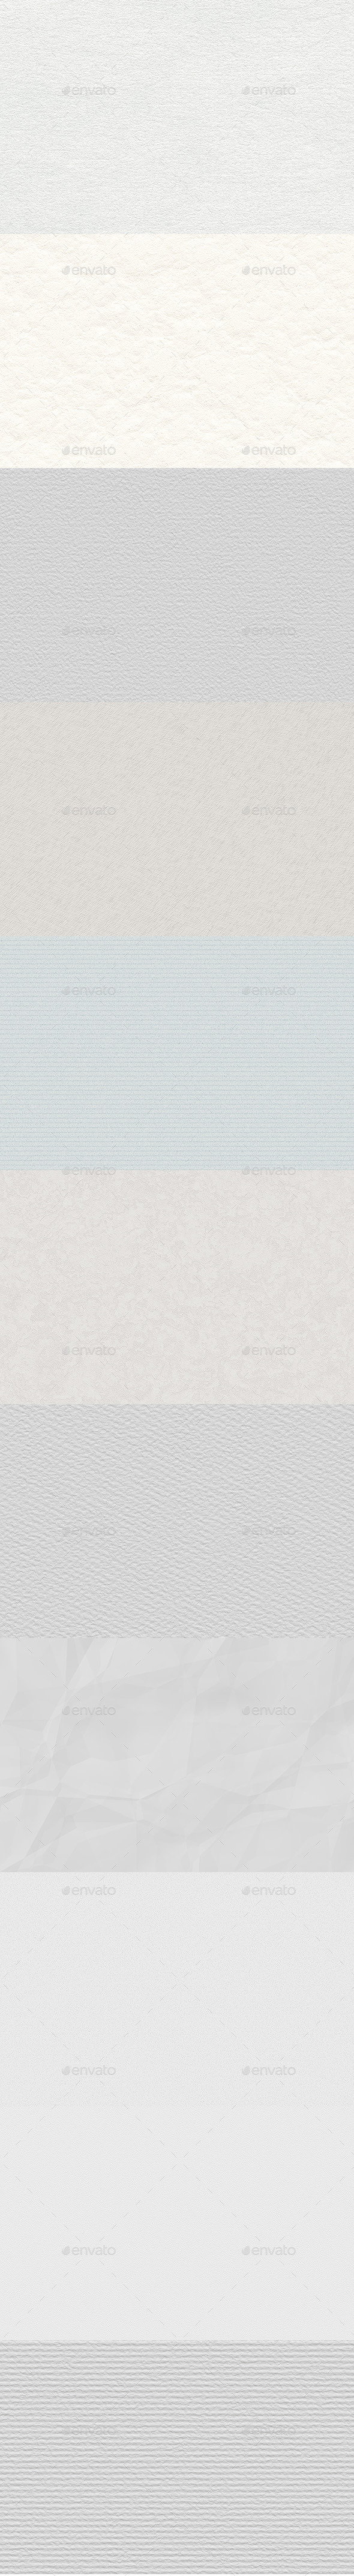 GraphicRiver Paper Textures 10664119